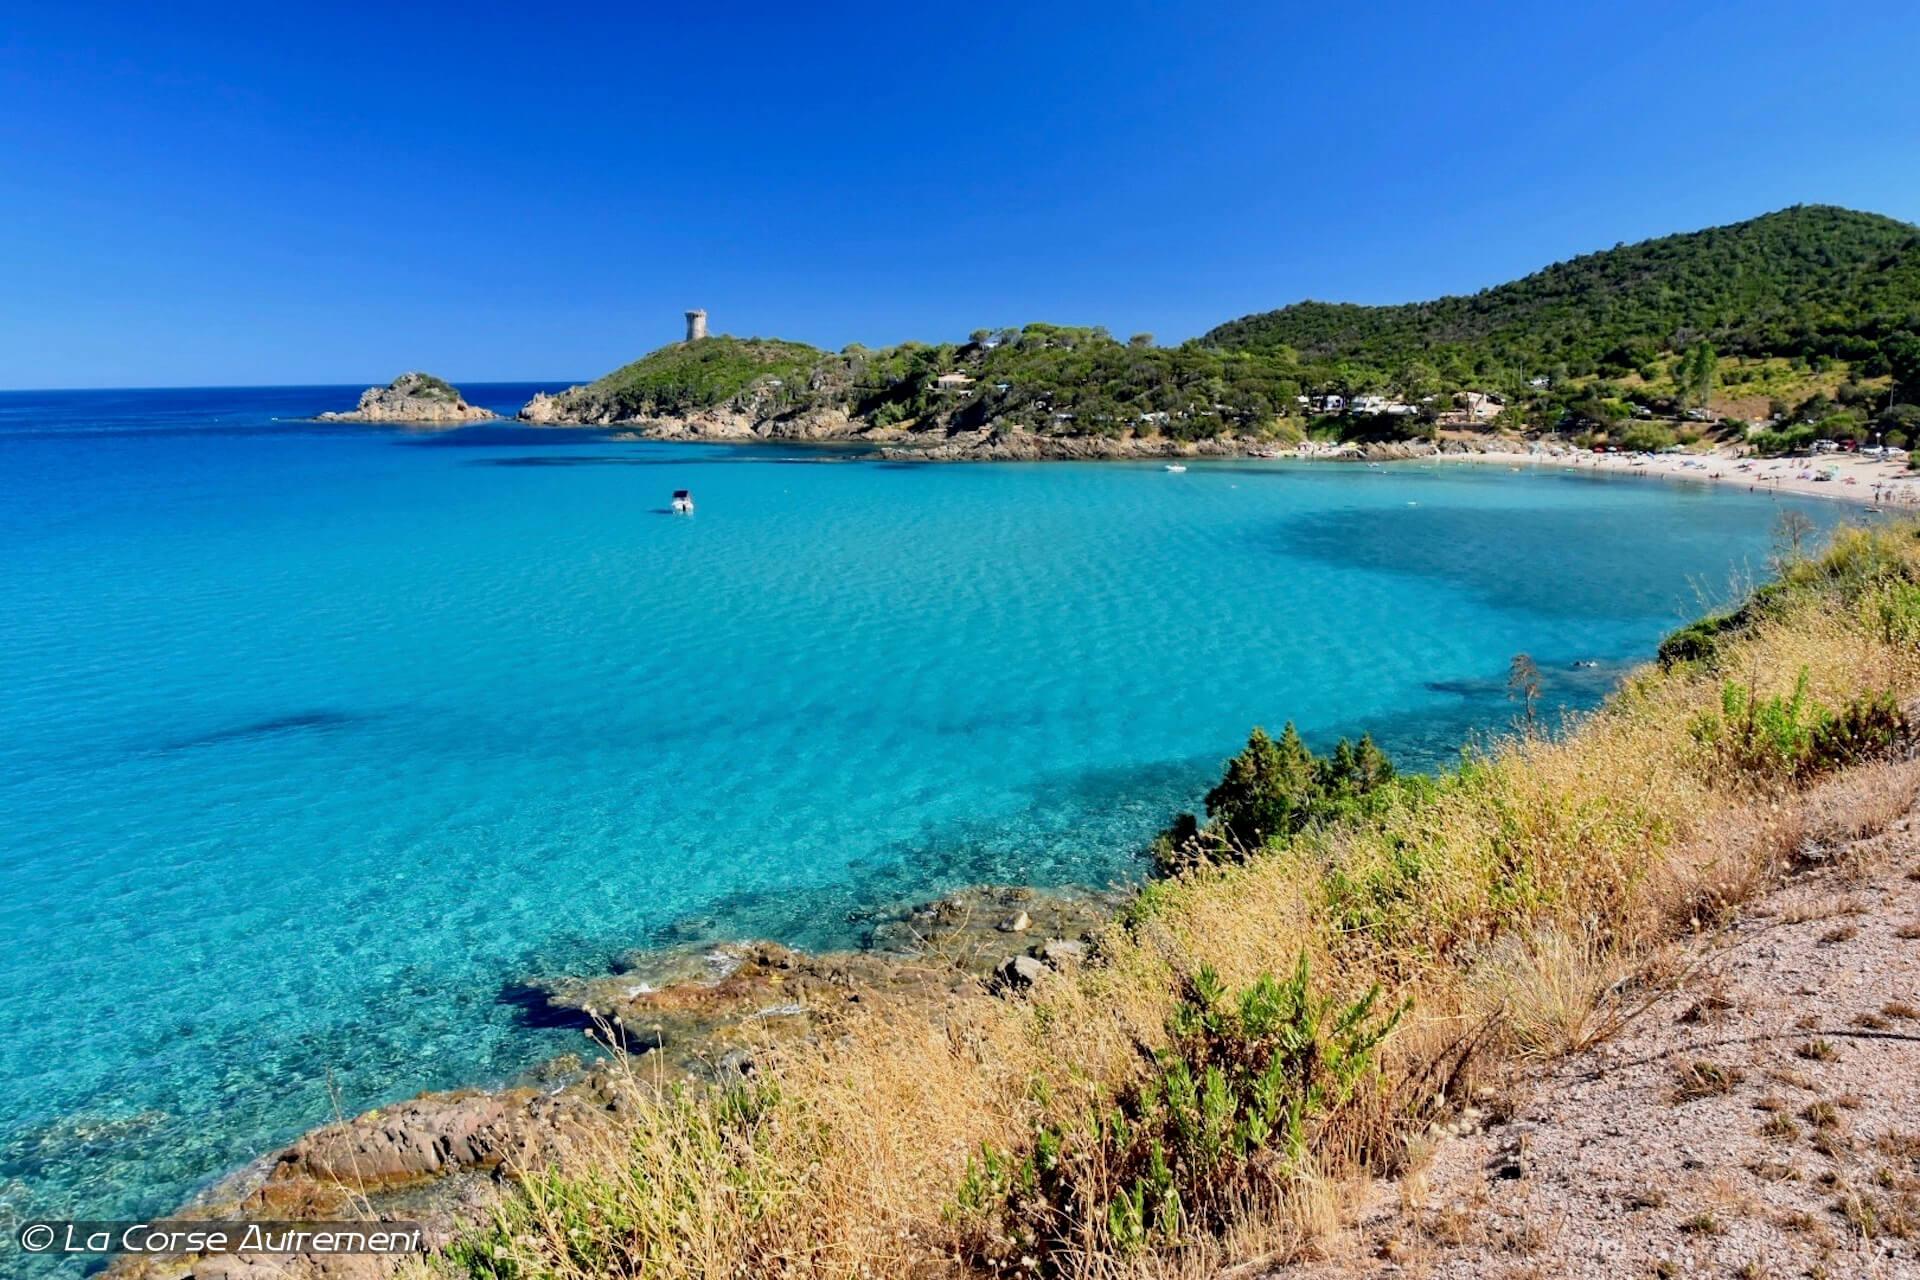 la plage de Fautea en Corse du Sud